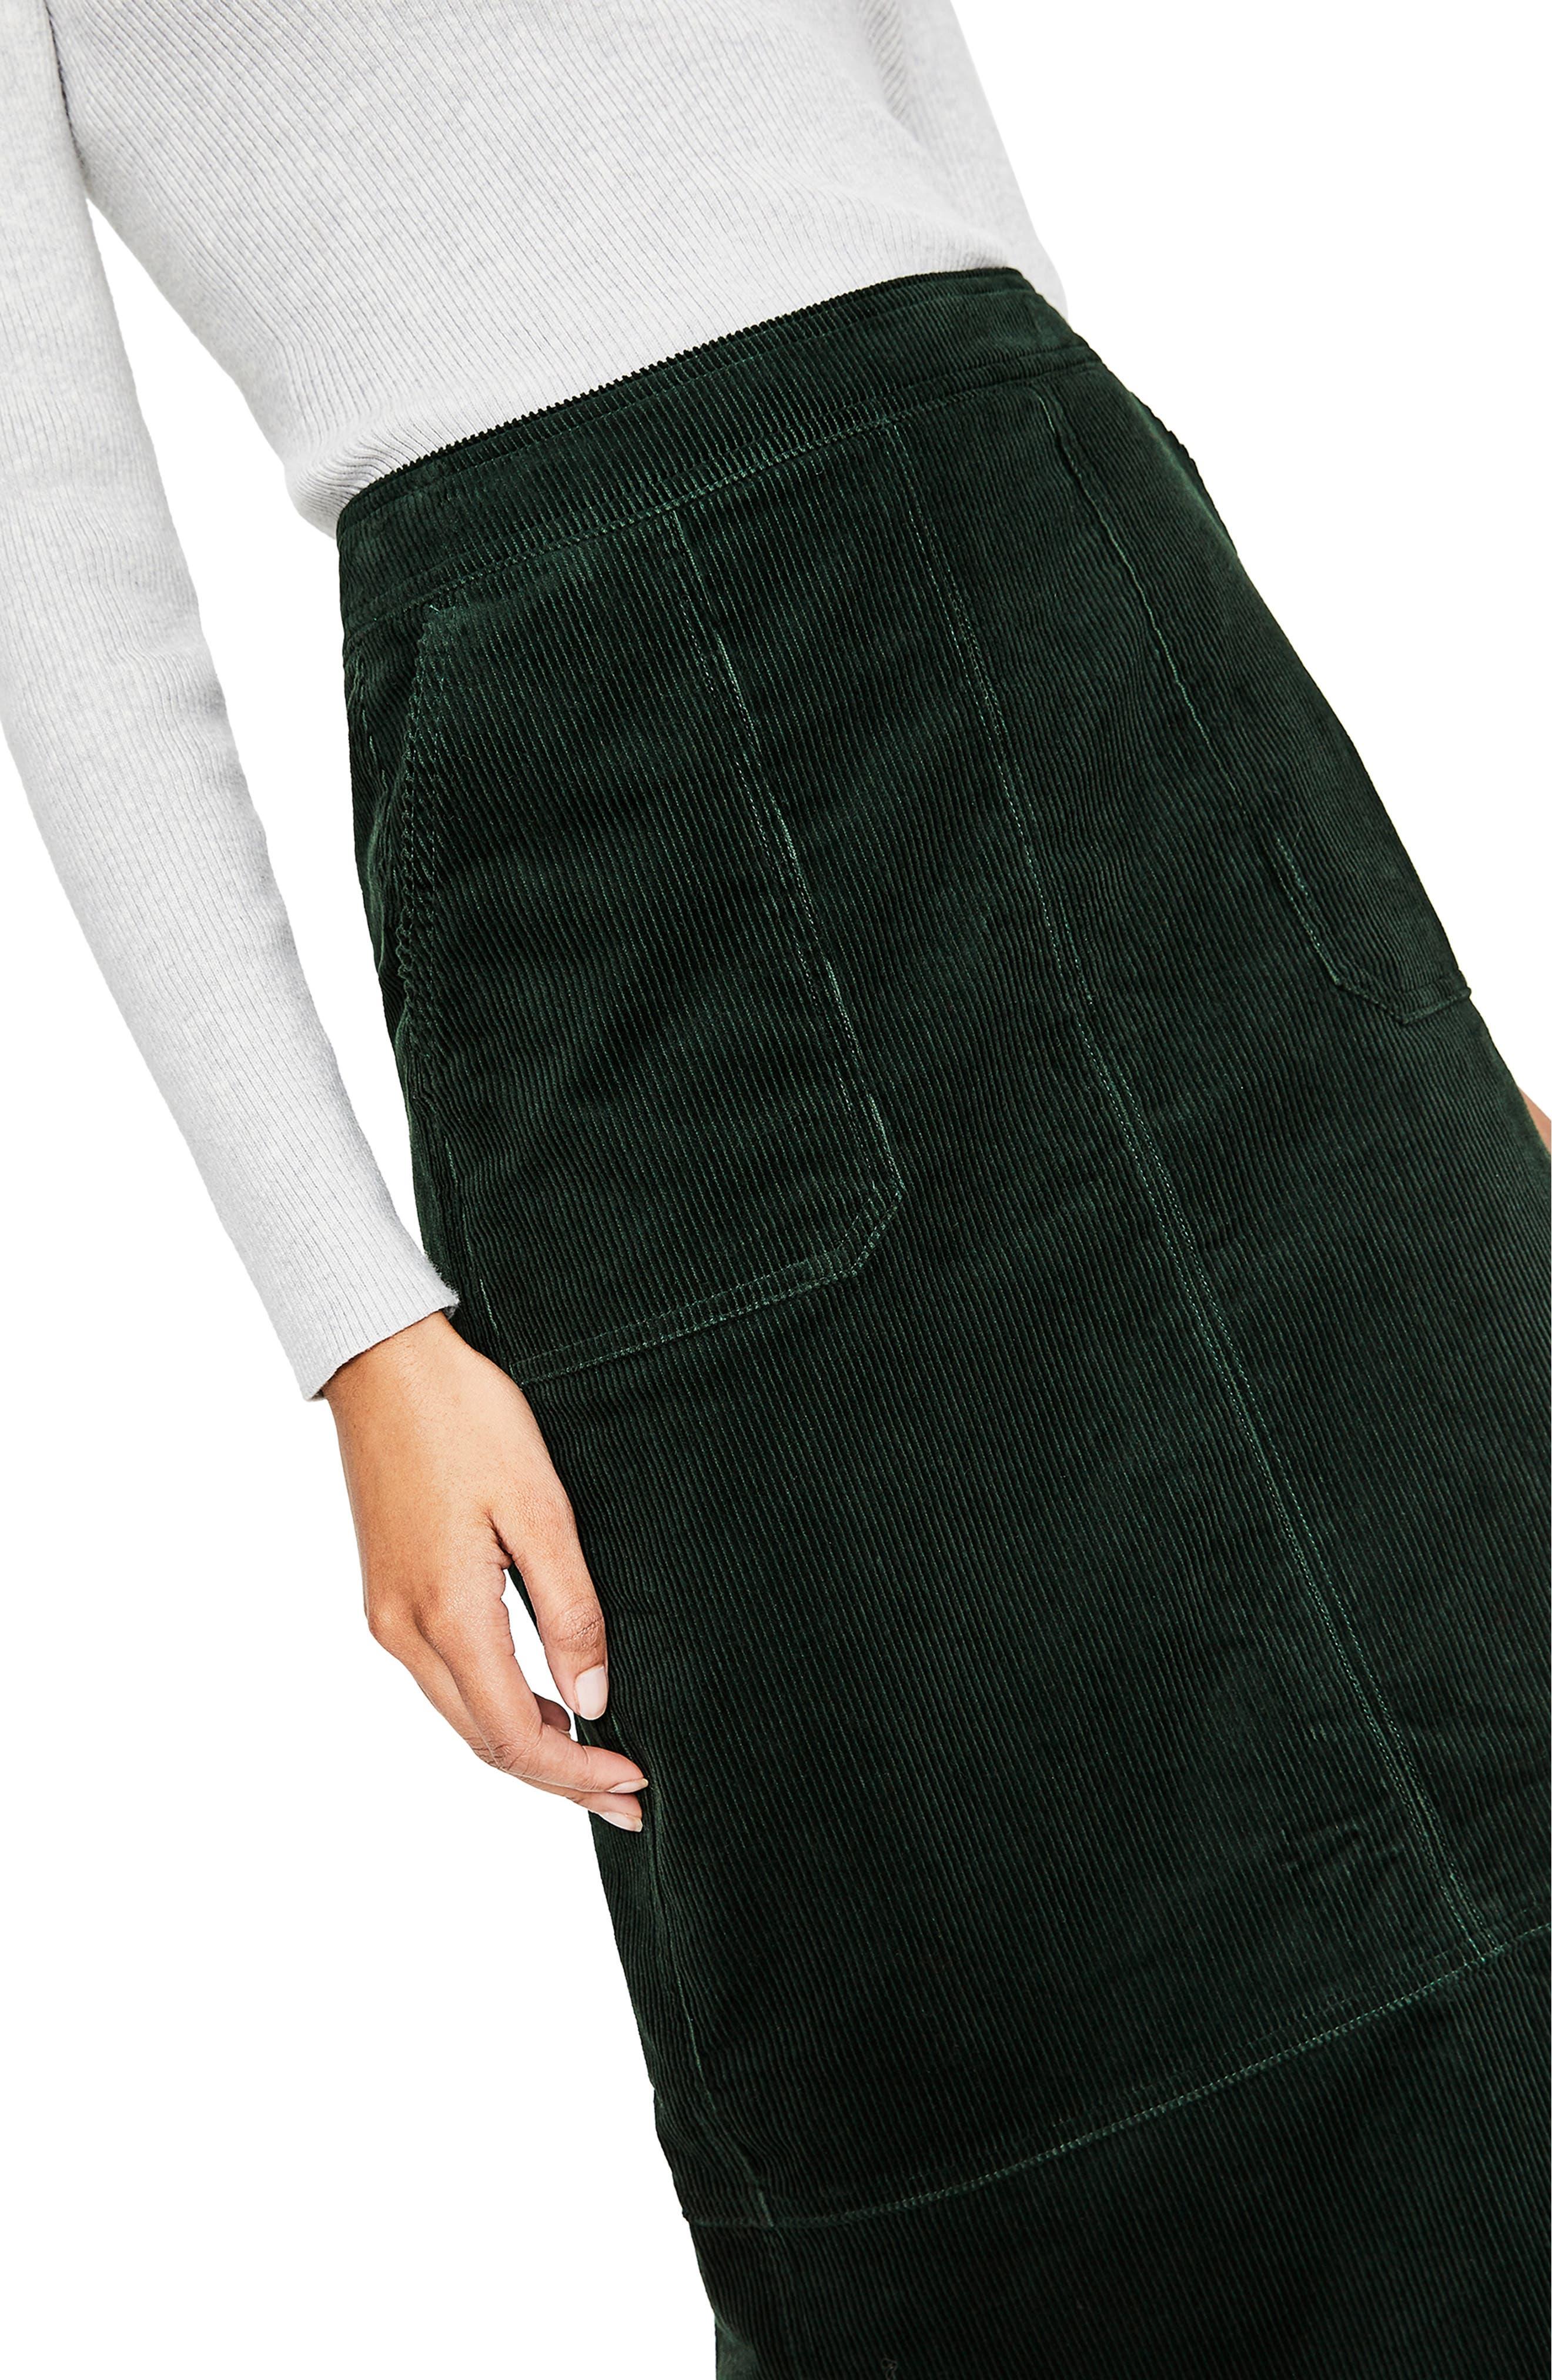 Patch Pocket Corduroy Midi Skirt,                             Alternate thumbnail 4, color,                             CHATSWORTH GREEN